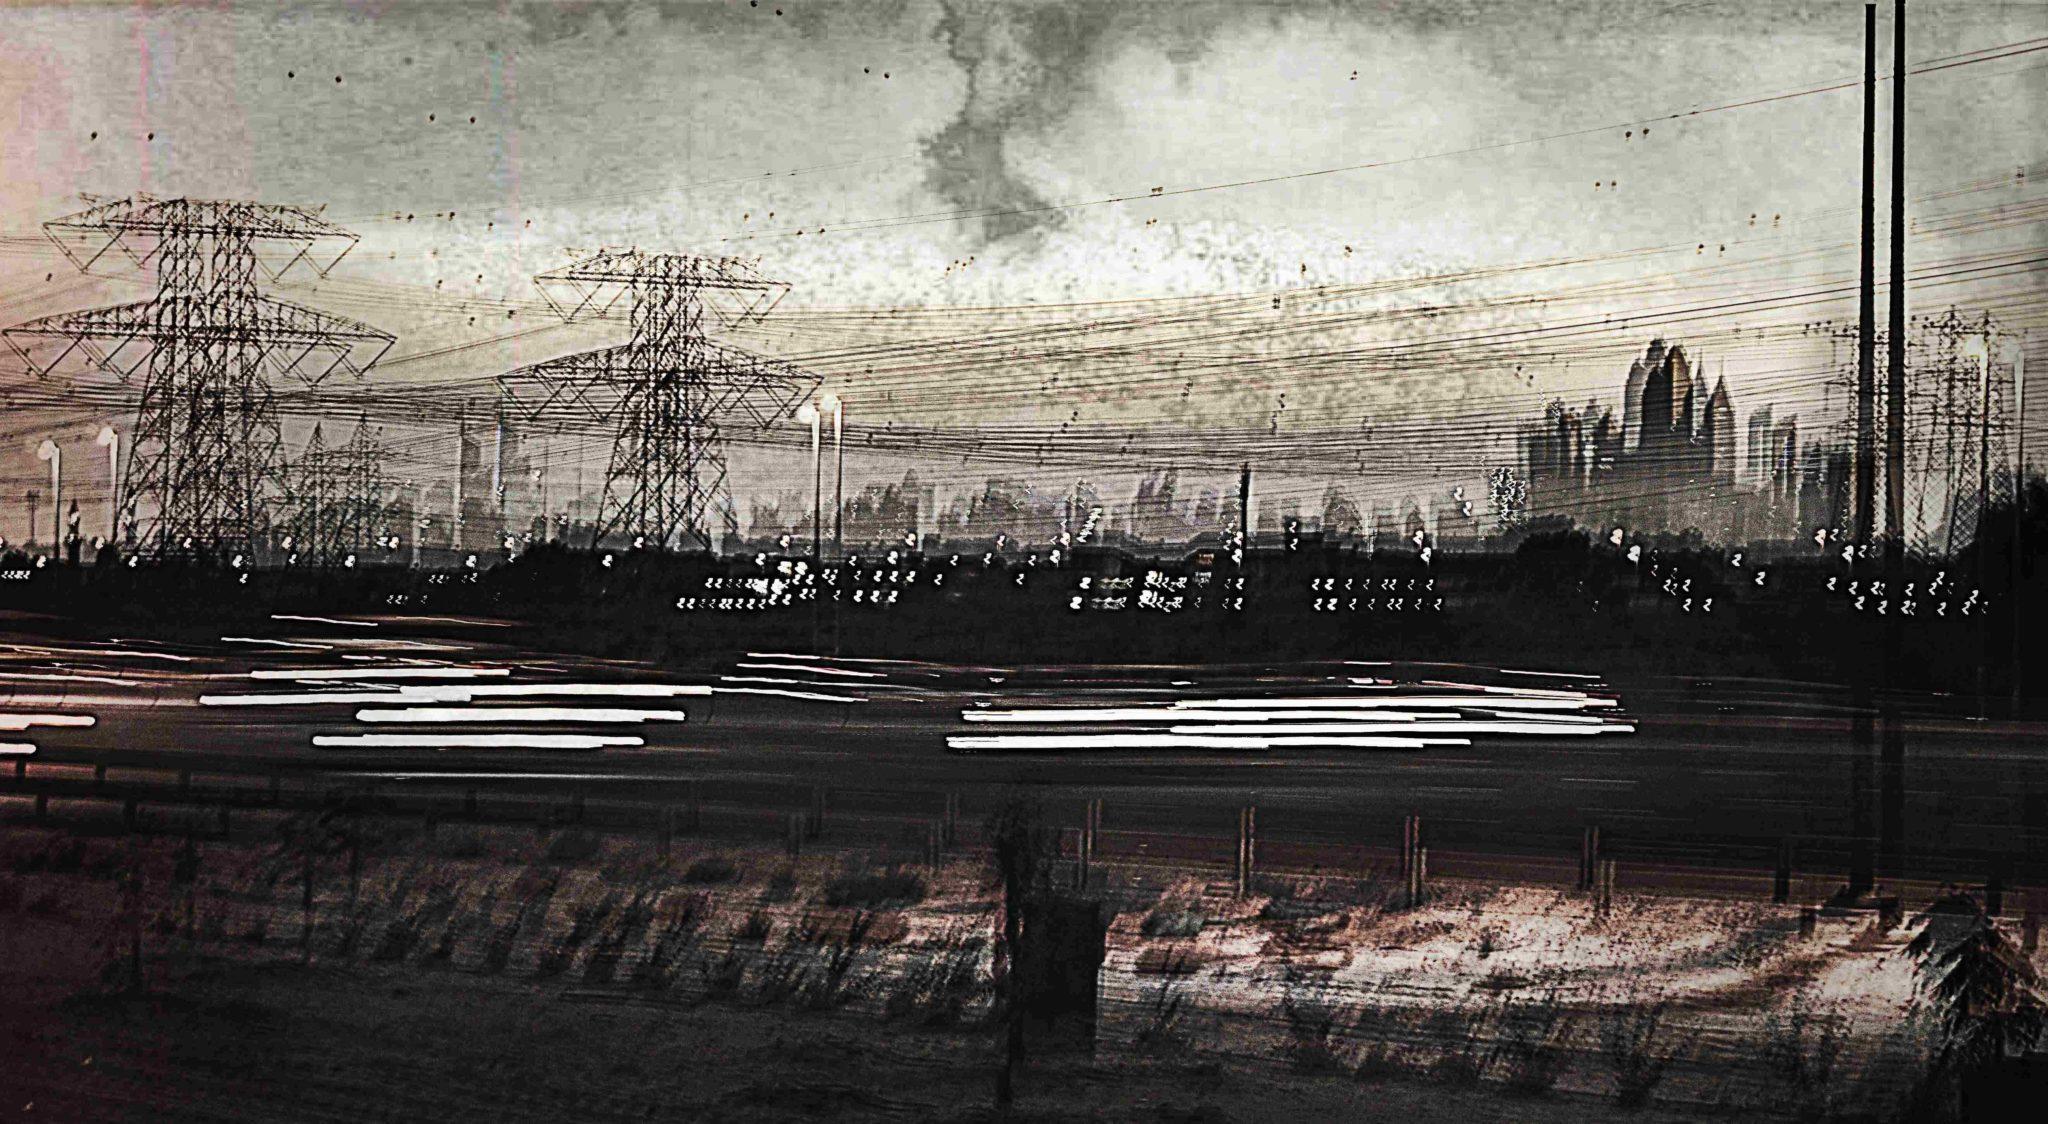 image-MediaBrief-From-Longnosepictures-Mahesh-Ramchandani-04